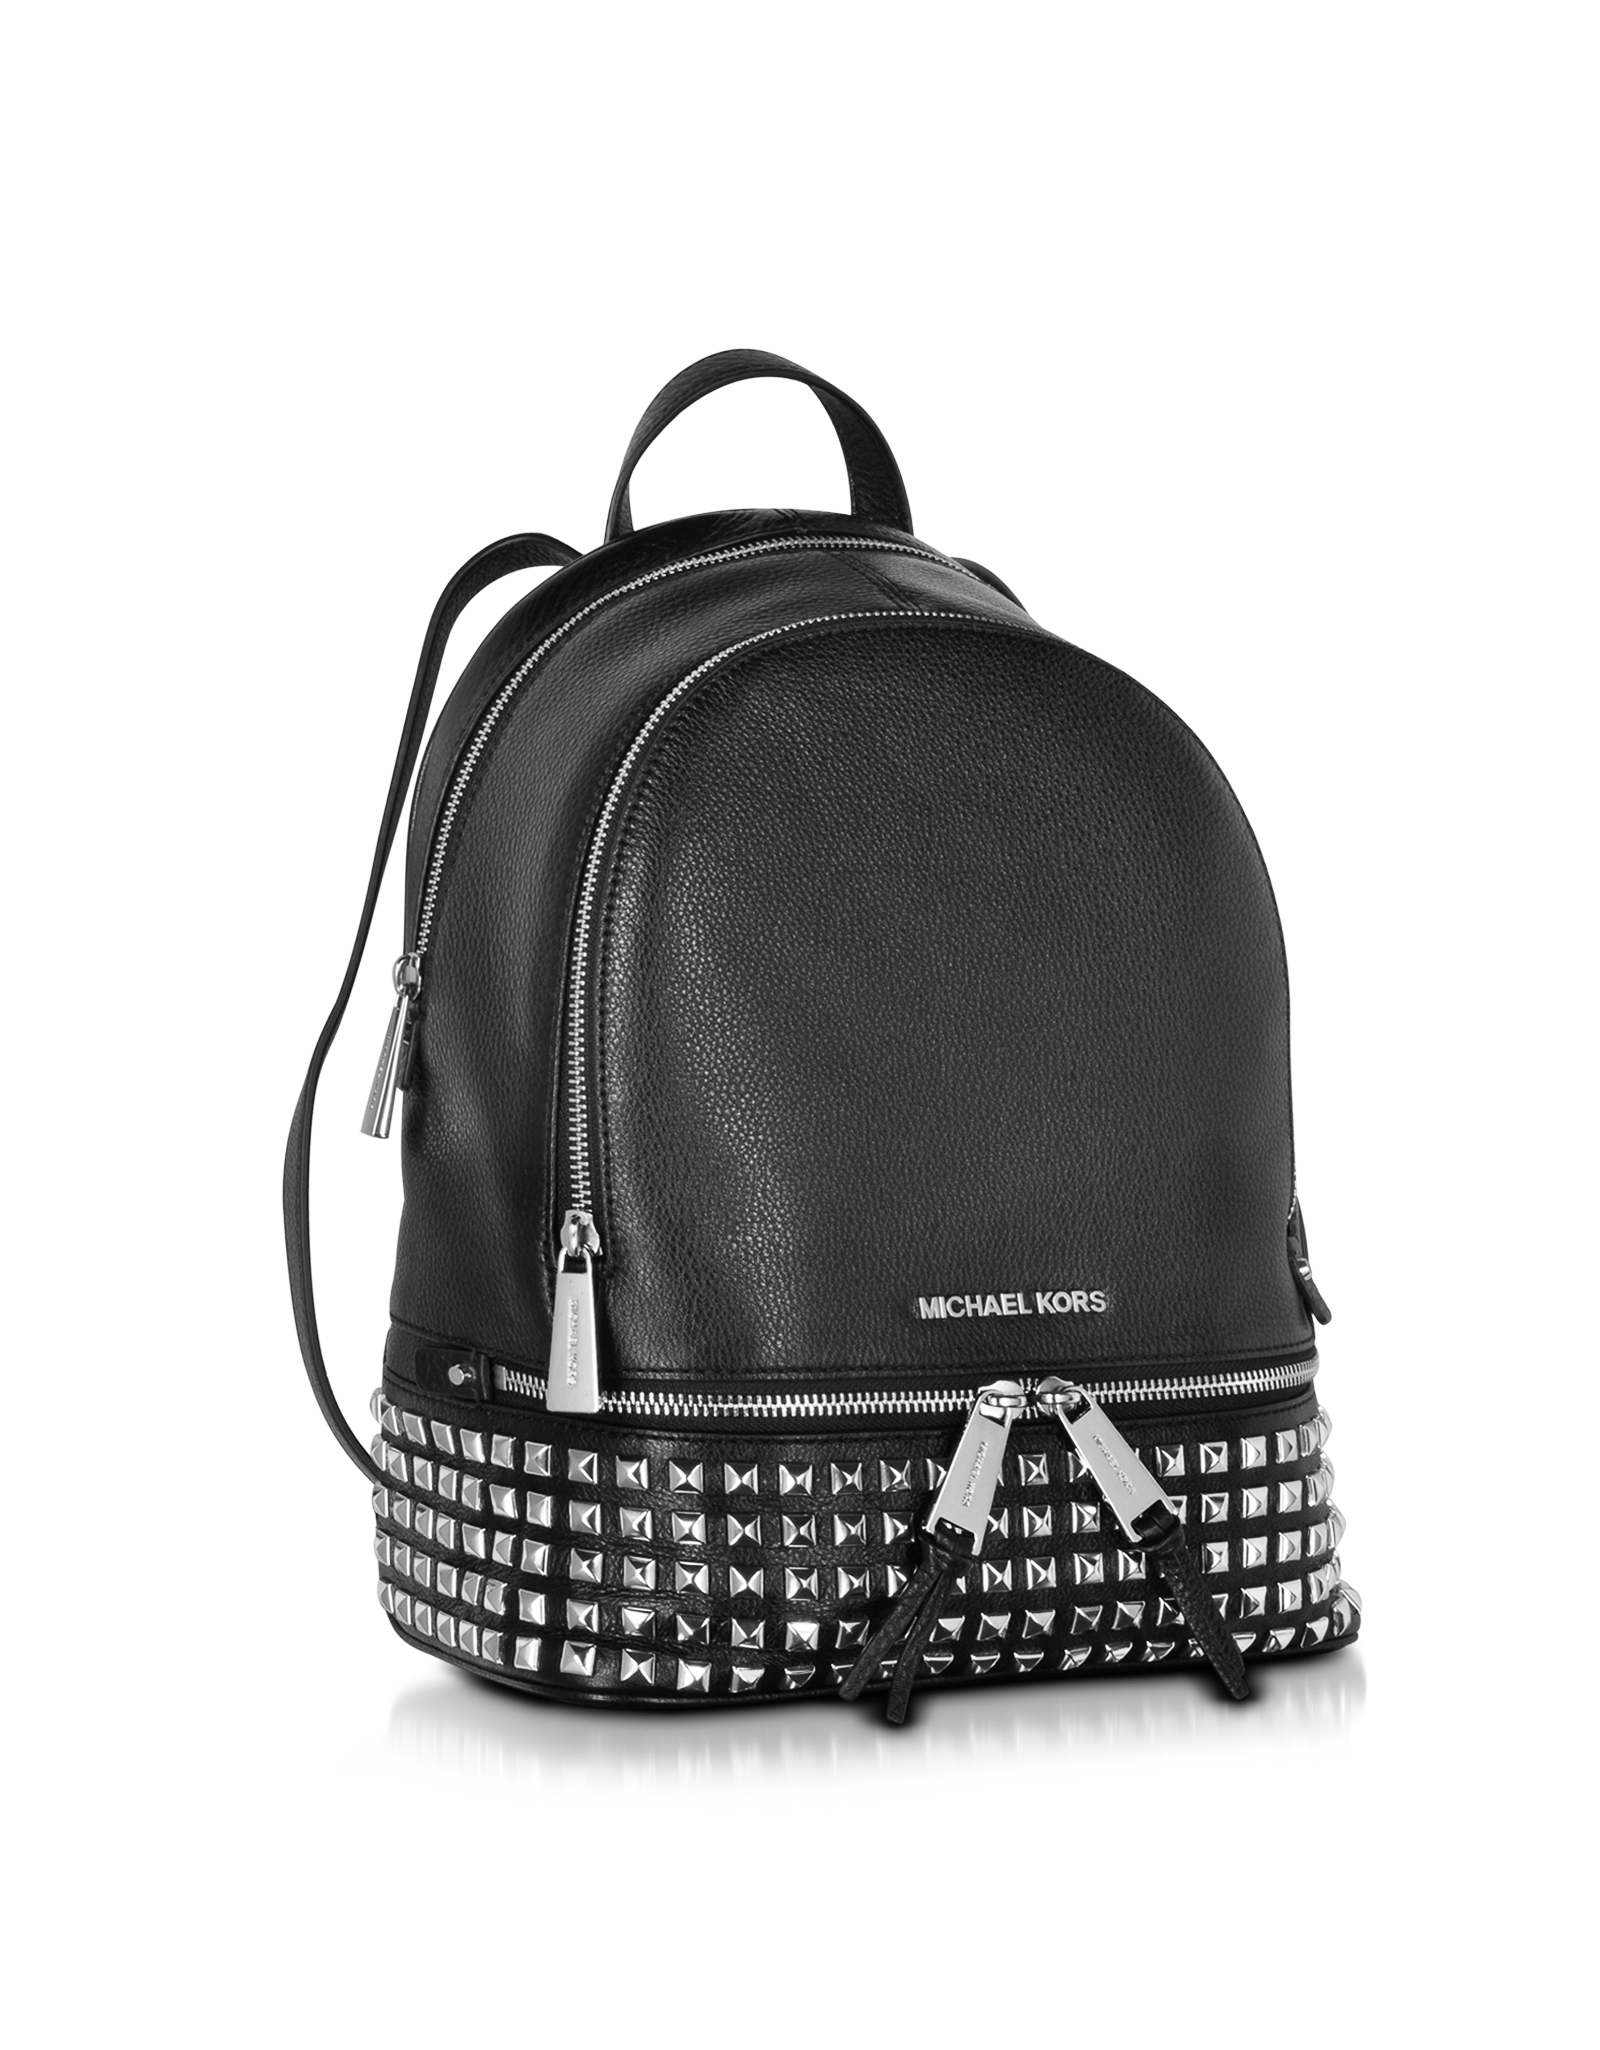 0186cadb879c Michael Kors Rhea Zip Small Studded Leather Backpack in Black - Lyst